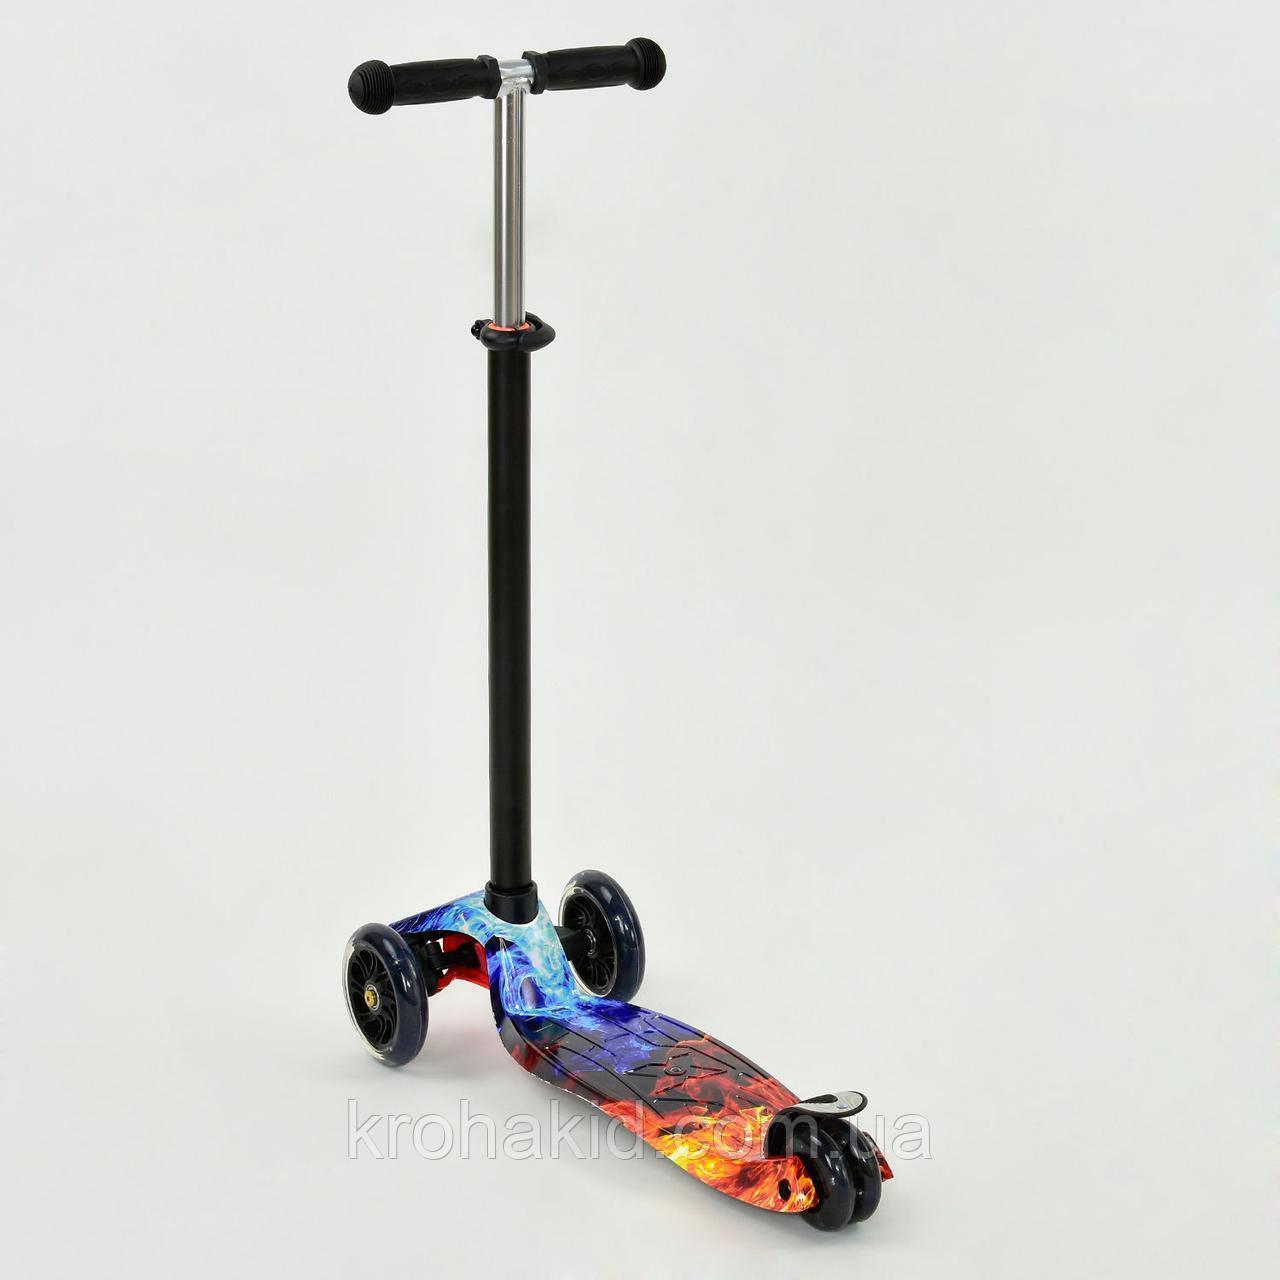 "Самокат трехколесный MAXI ""Best Scooter"" А 24665/779-1314, свет. колеса PU, трубка руля алюминиевая"